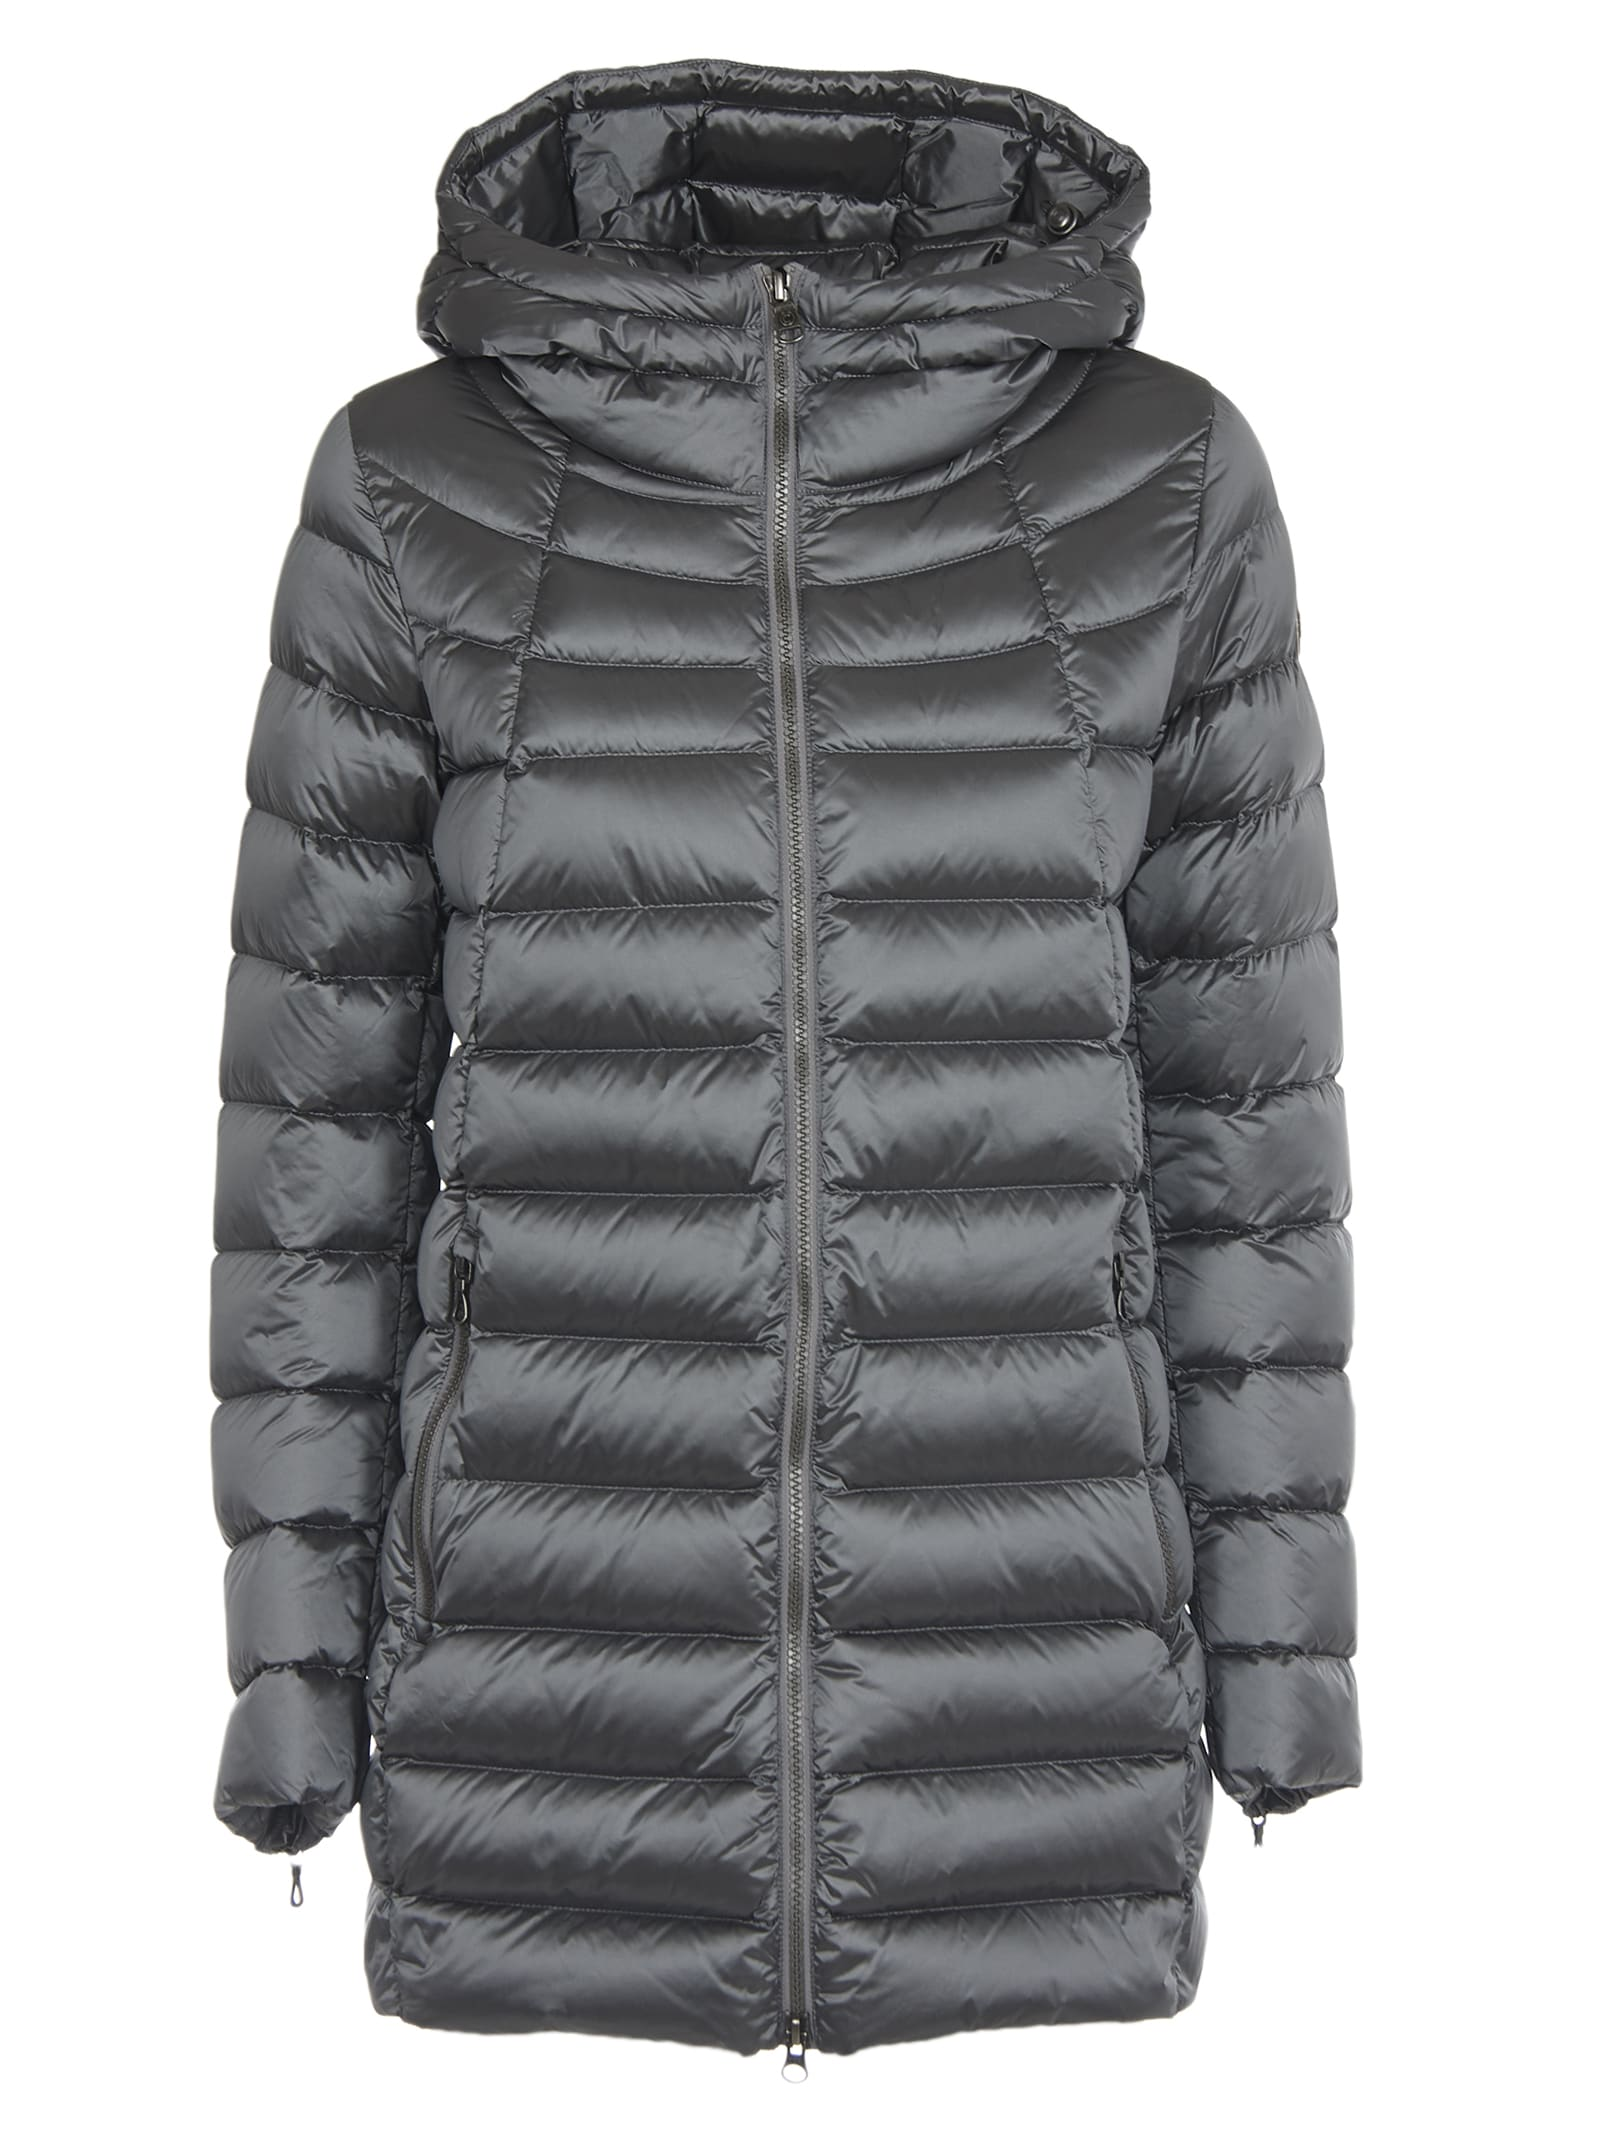 Colmar Grey Jacket With Hood